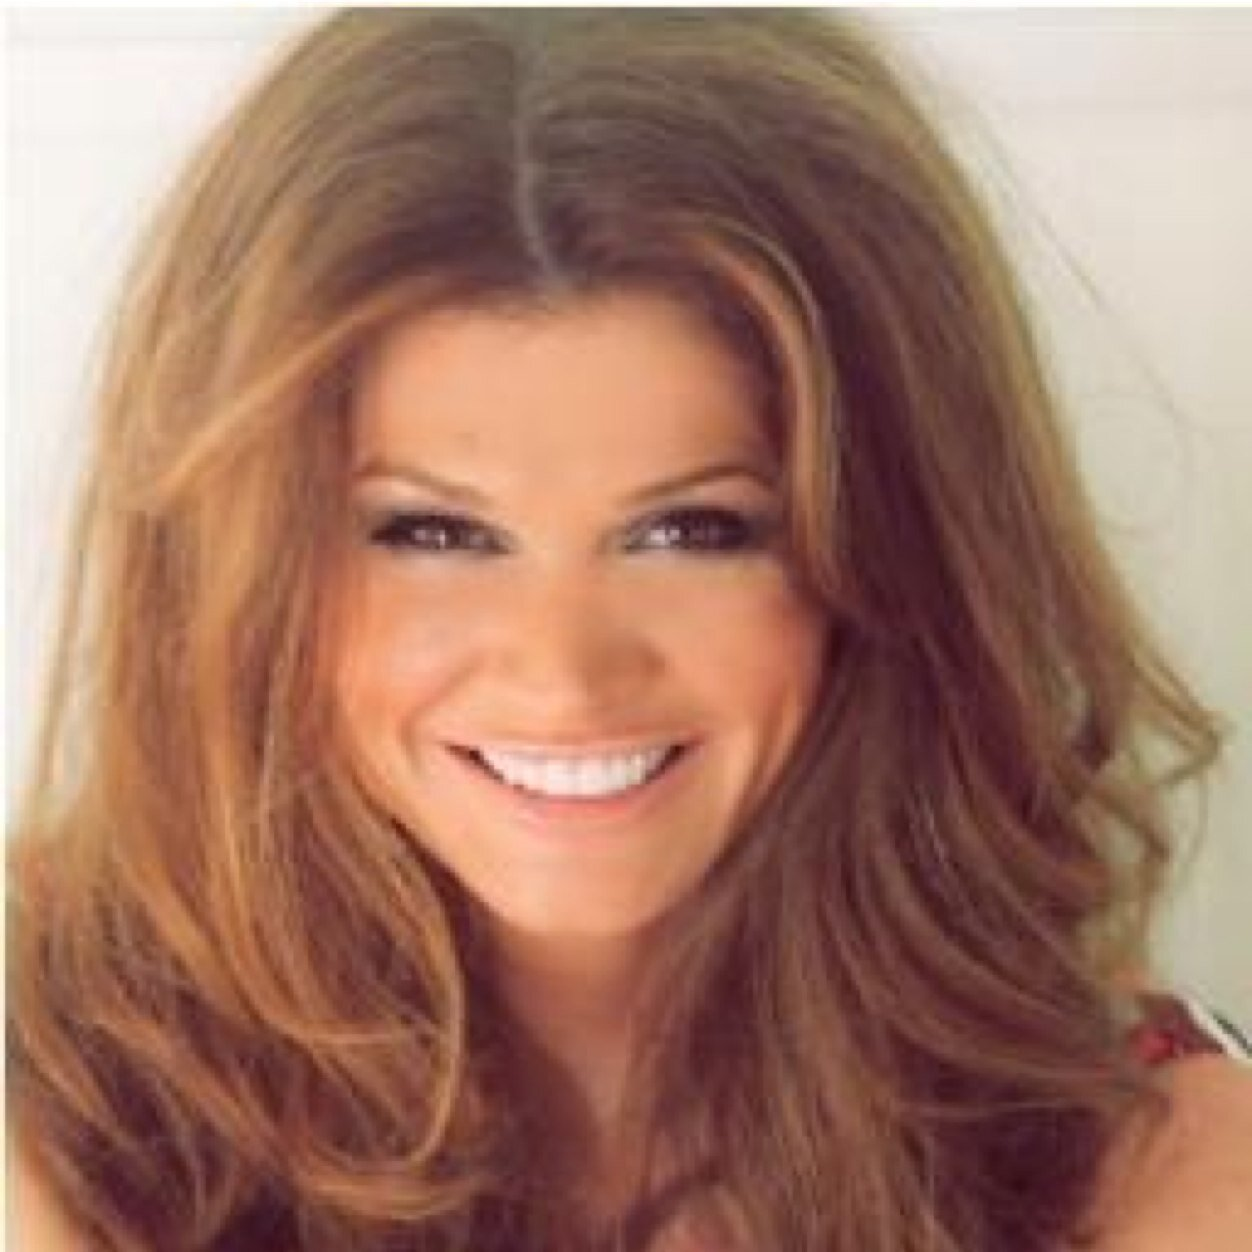 Lynette Carolla